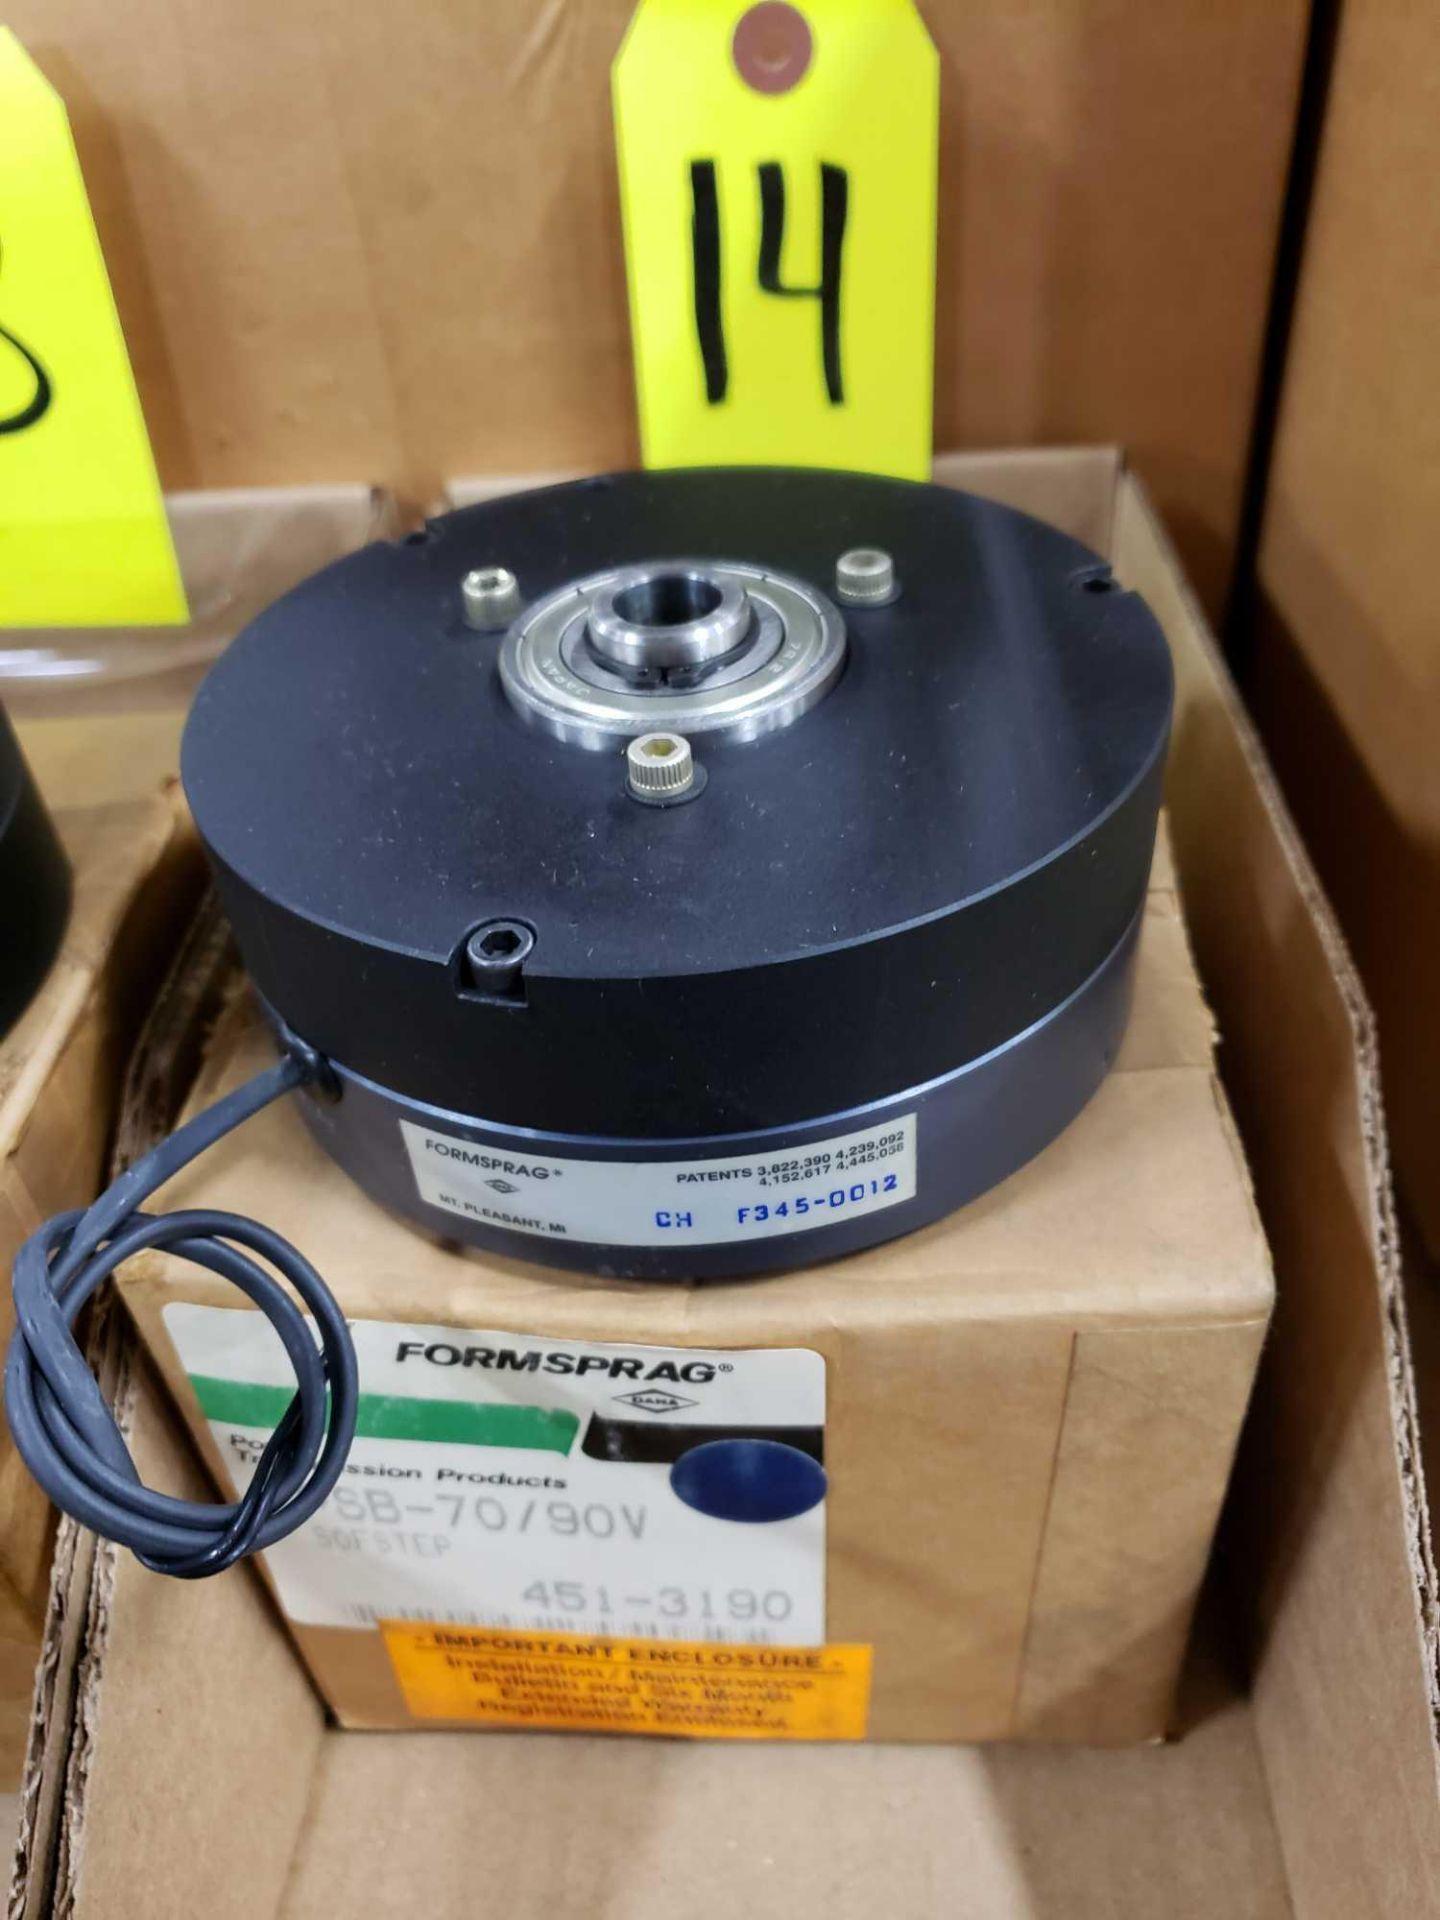 Lot 14 - Formsprag Magpowr sofstep model PSB-70/90V magnetic partical clutch brake. New in box.